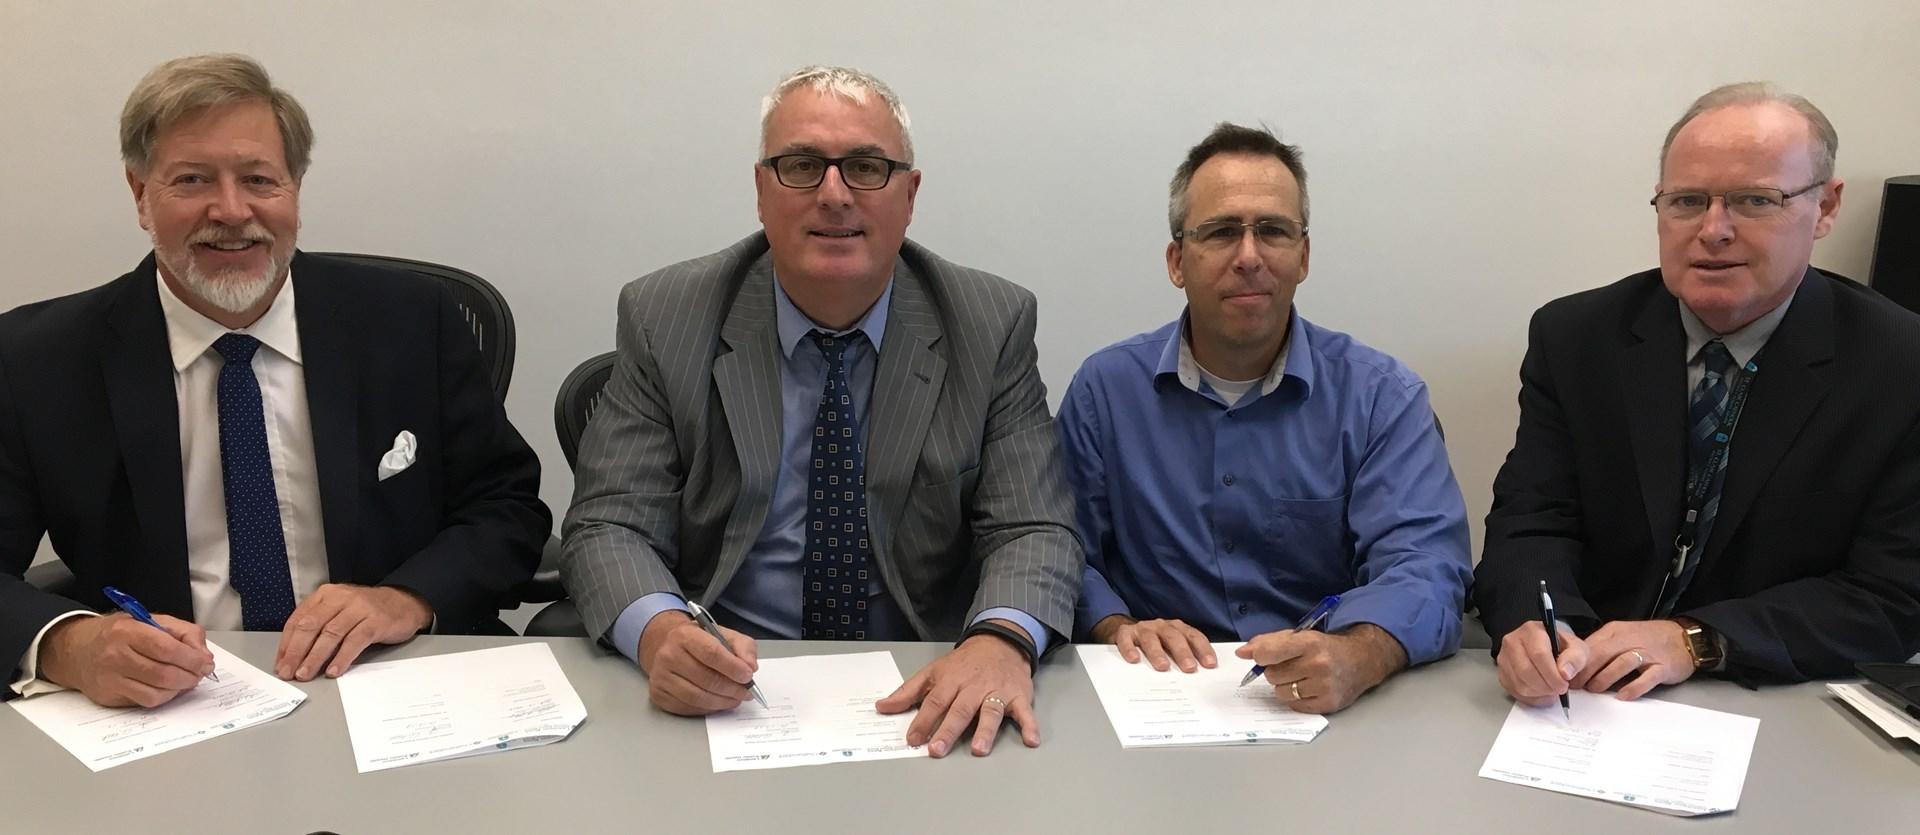 Oct2017_MOU_Signing_LKDSB_SCCDSB_Public_Health_News.jpg